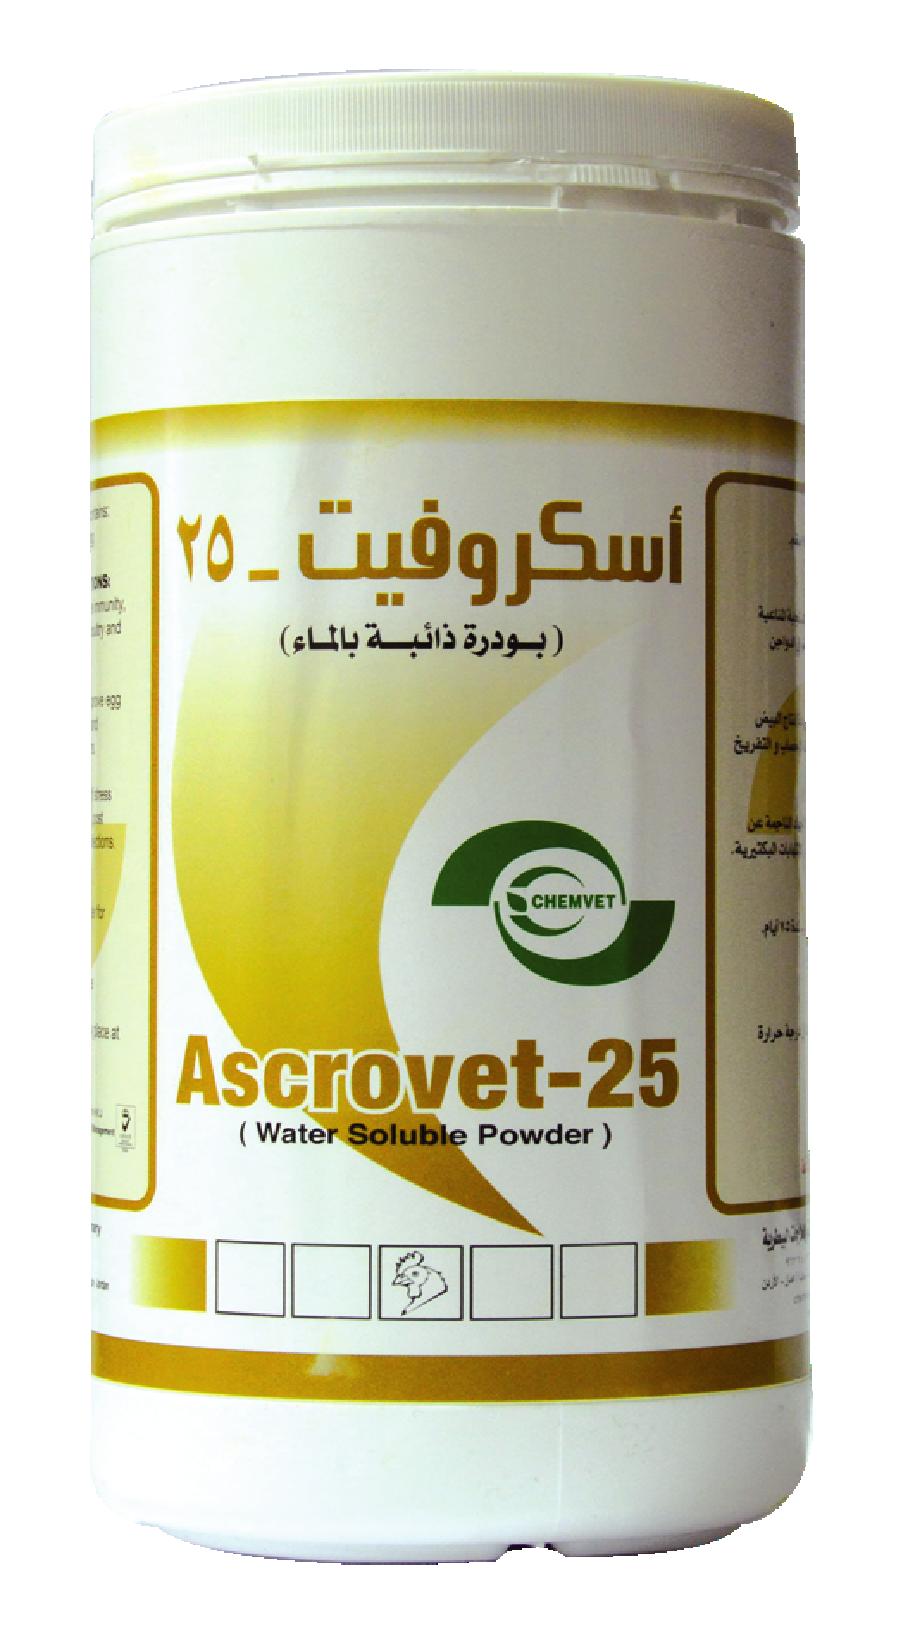 ASCROVET 25